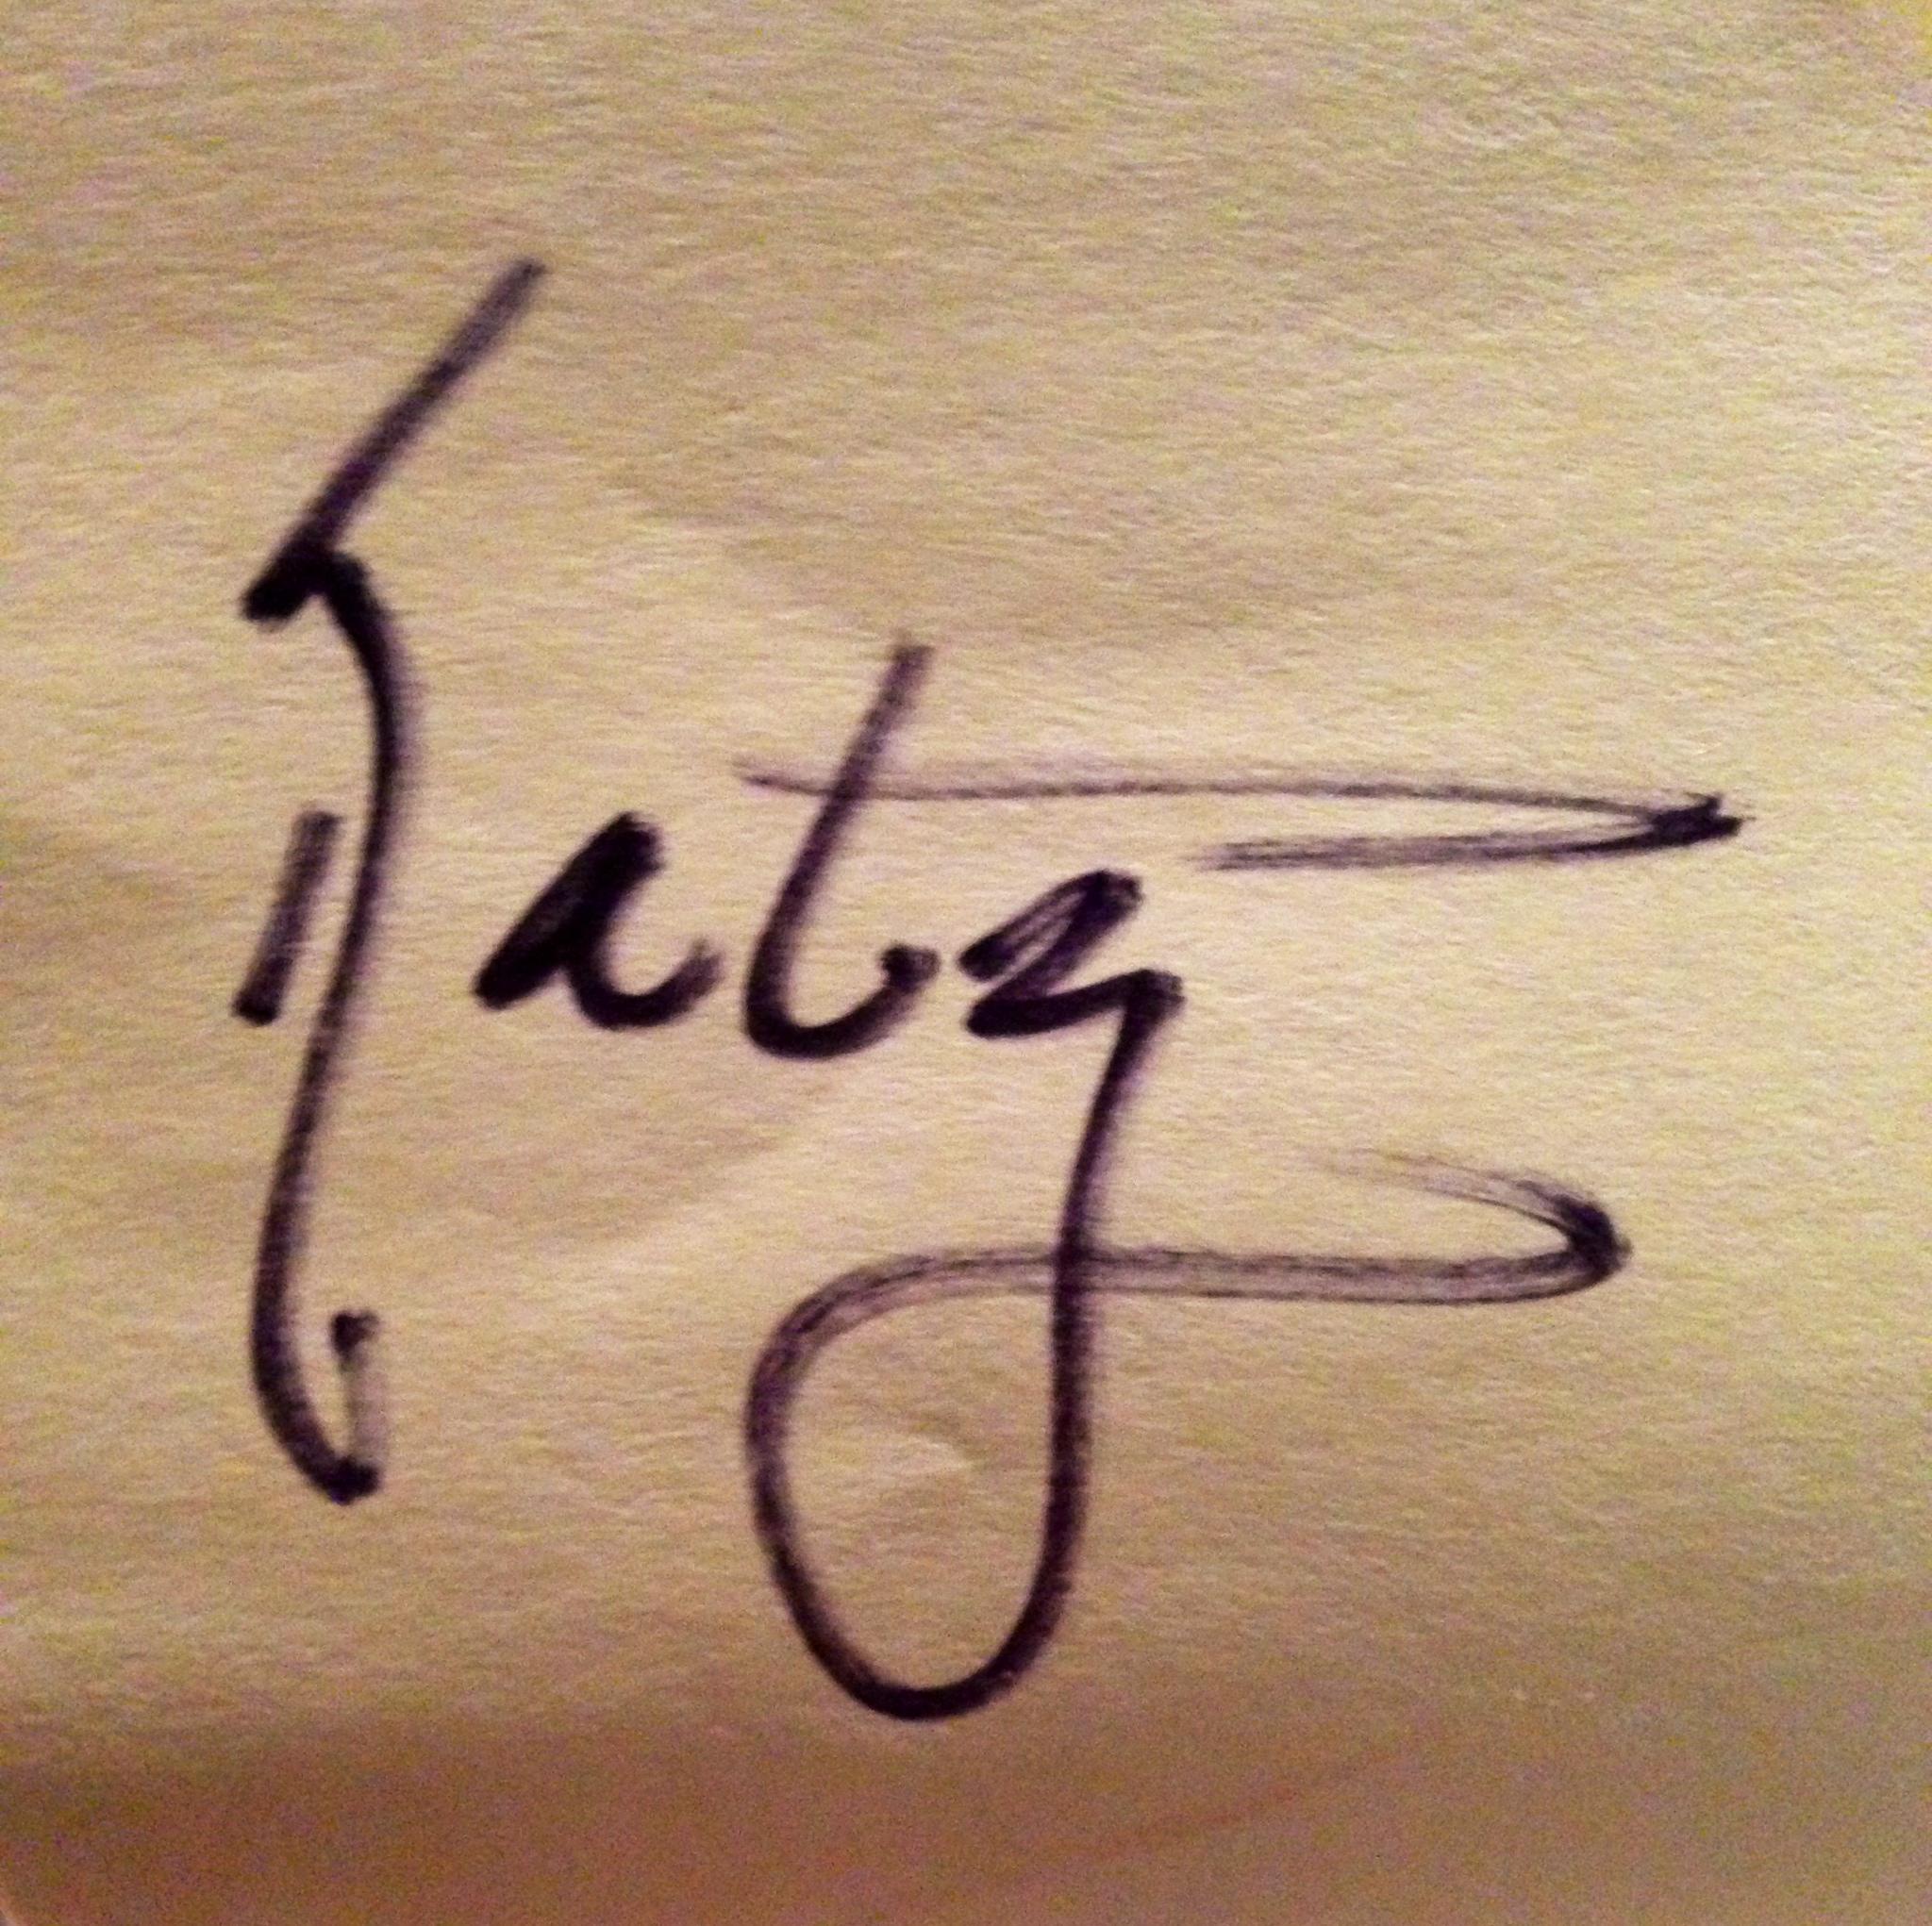 Kathy Linden's Signature